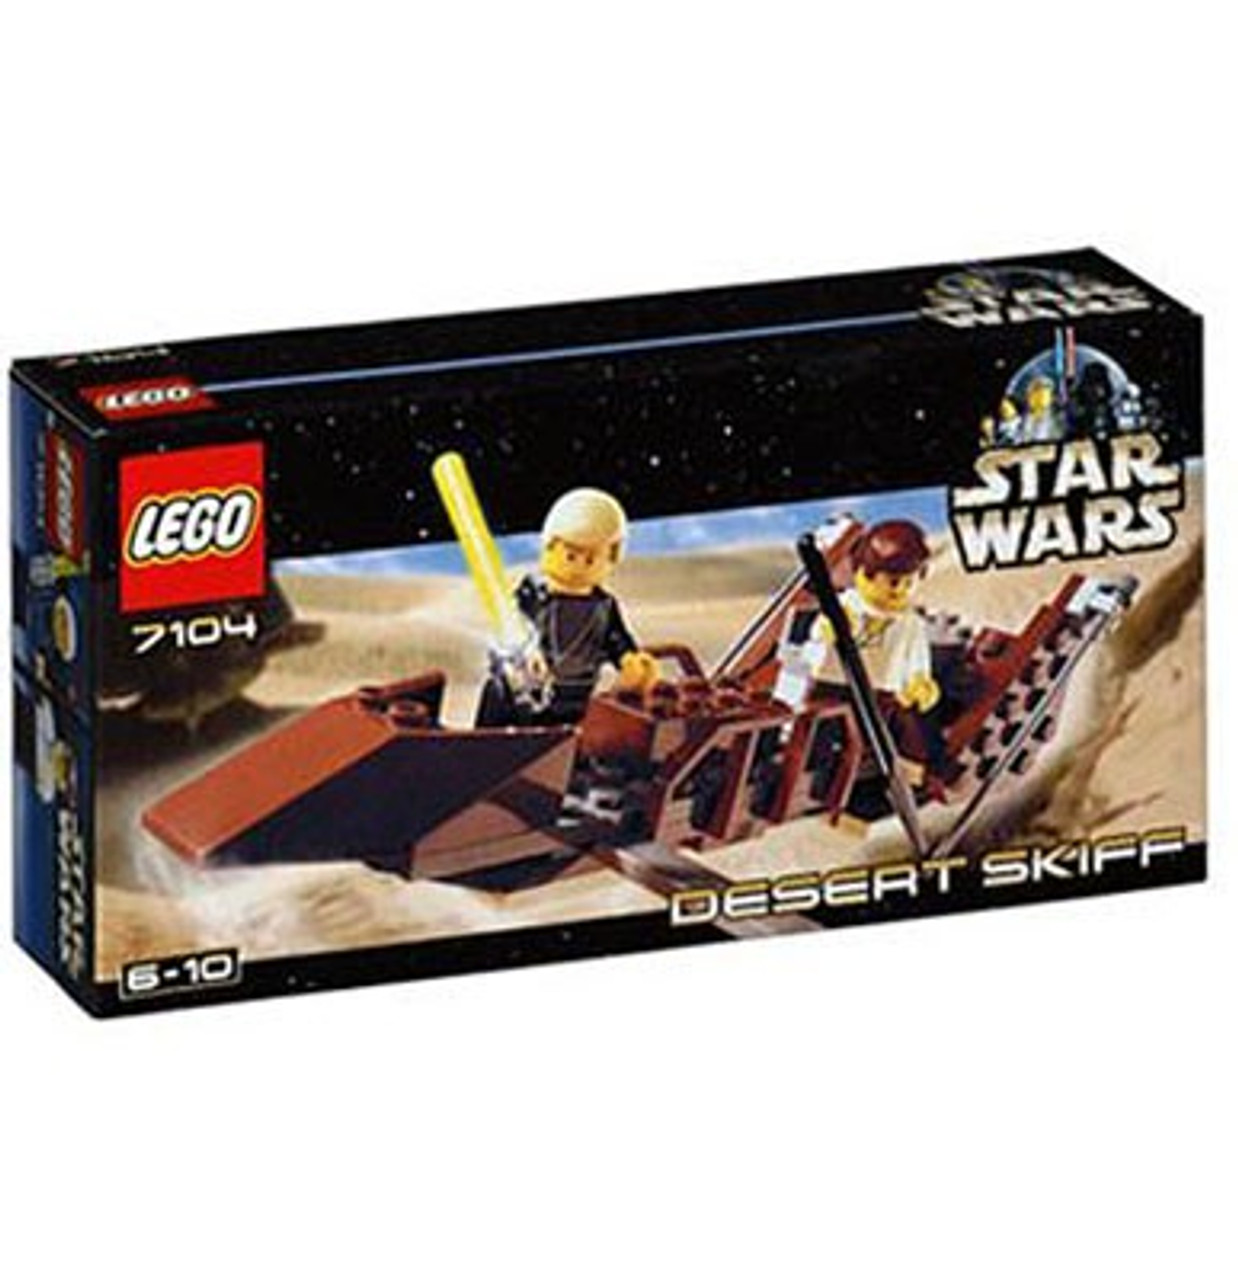 LEGO Star Wars Return of the Jedi Desert Skiff Mini Set #7104 [New]